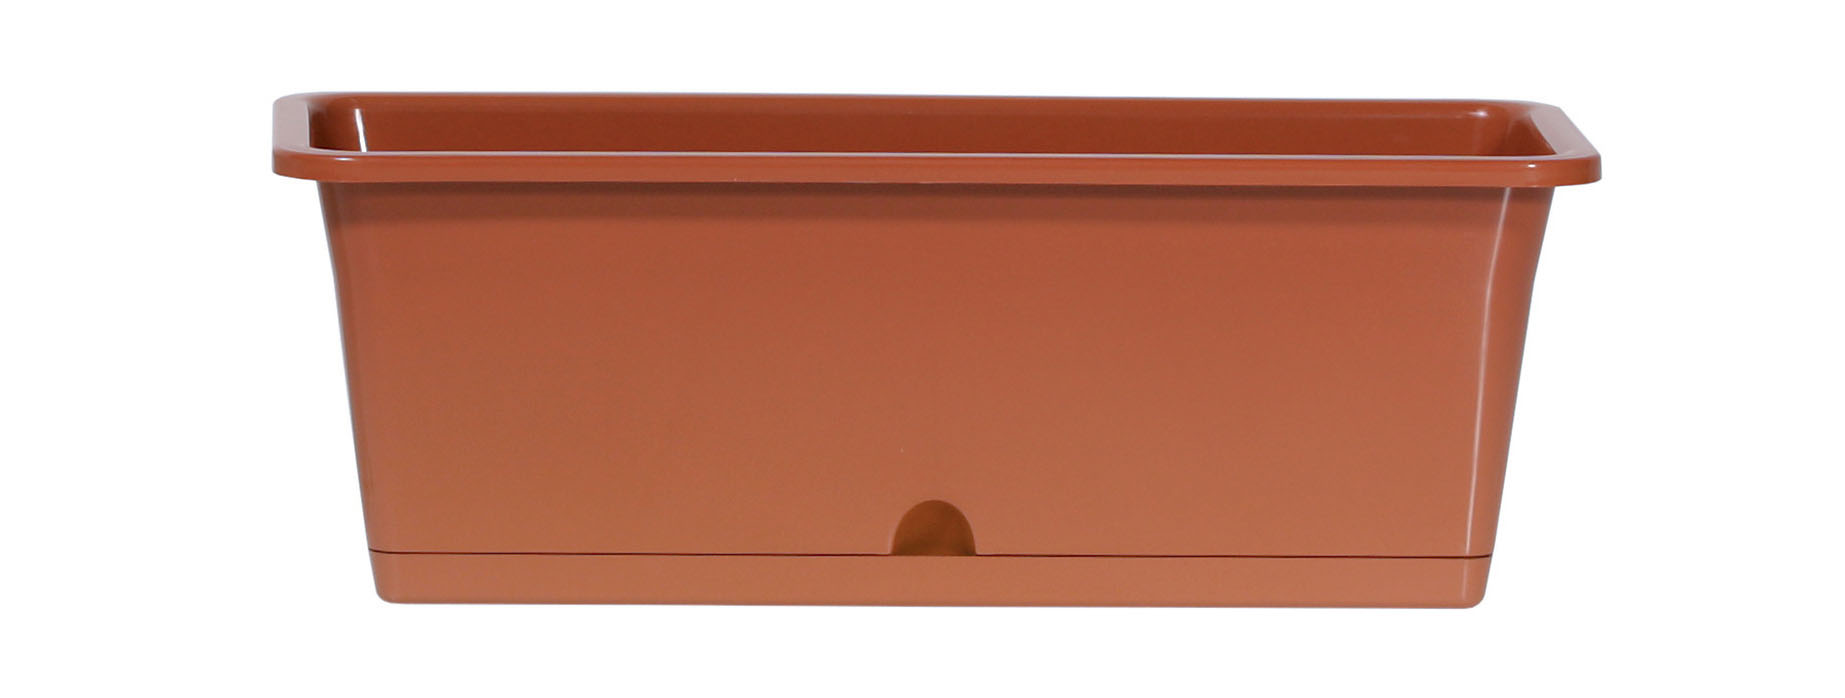 PROSPERPLAST Truhlík CAMELIA terakota 59,5cm